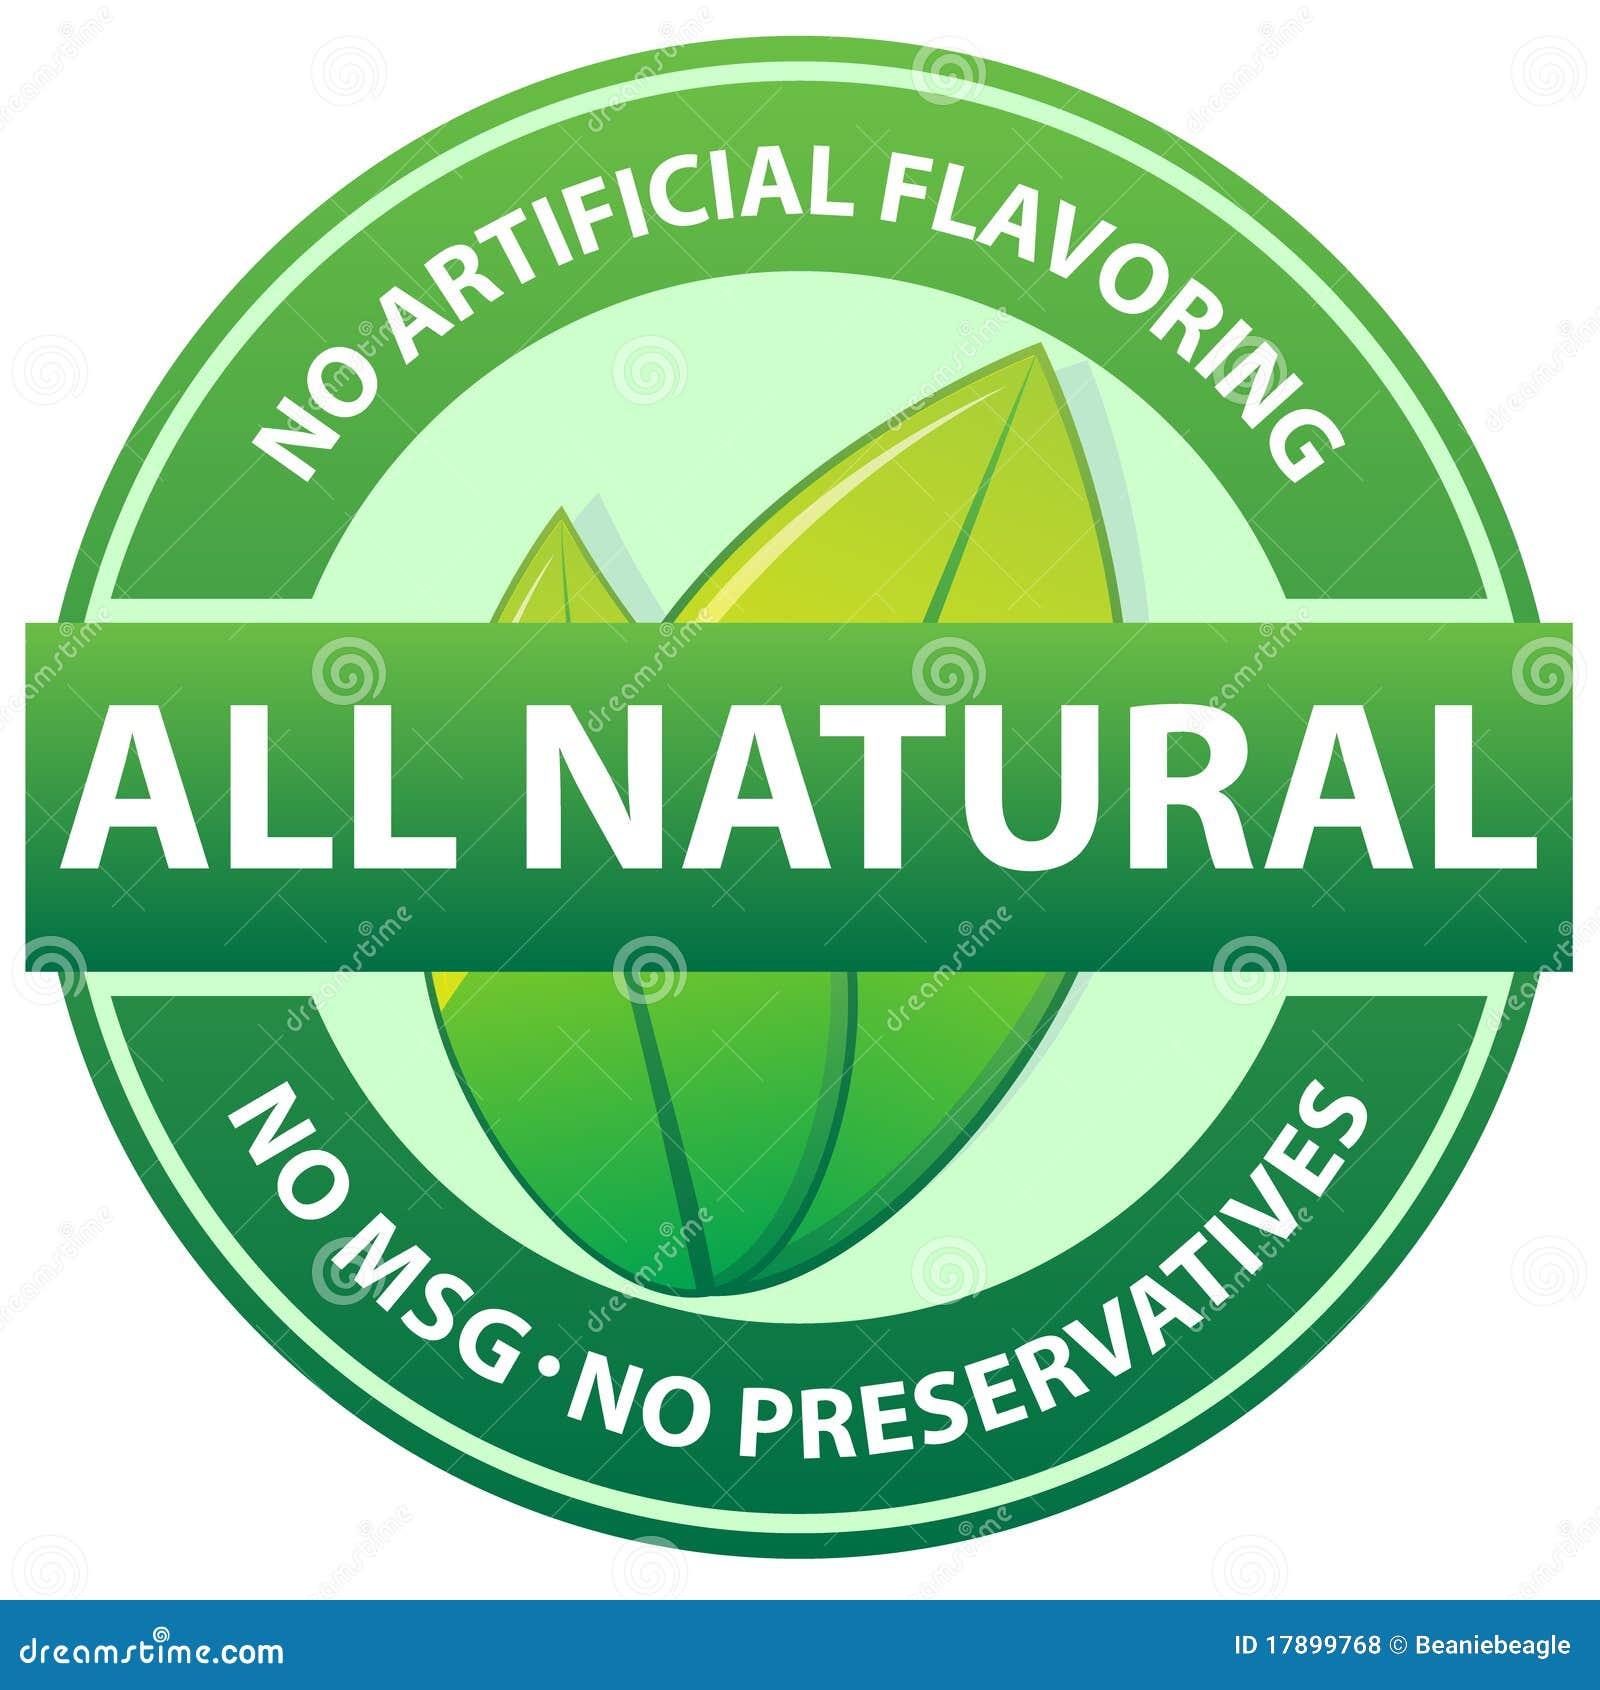 All Natural Food Seal Royalty Free Stock Photos - Image ...